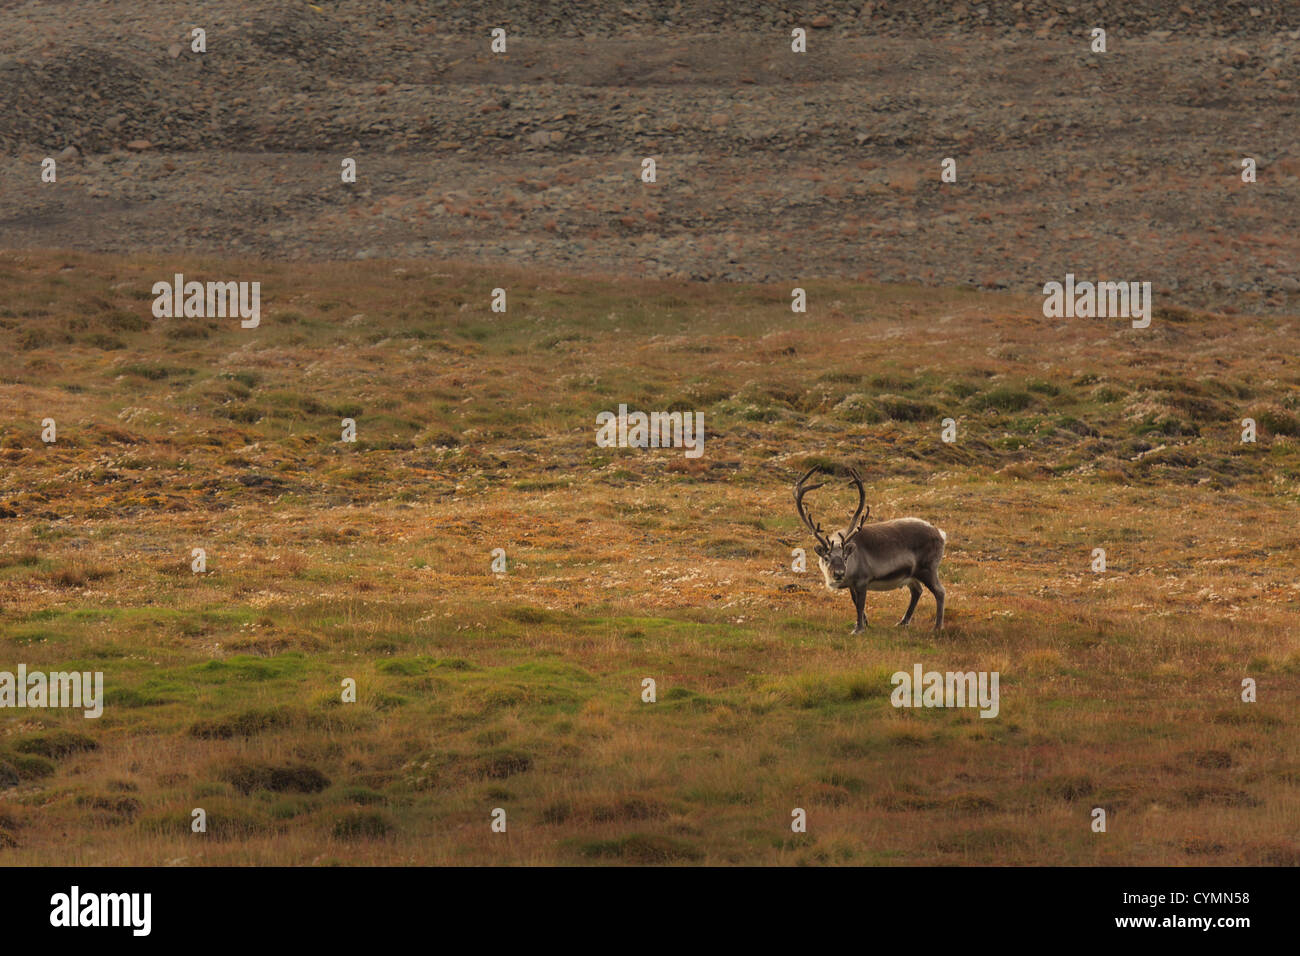 Einsamer Elch im Feld.  Horizontal gerahmten Schuss. Stockbild